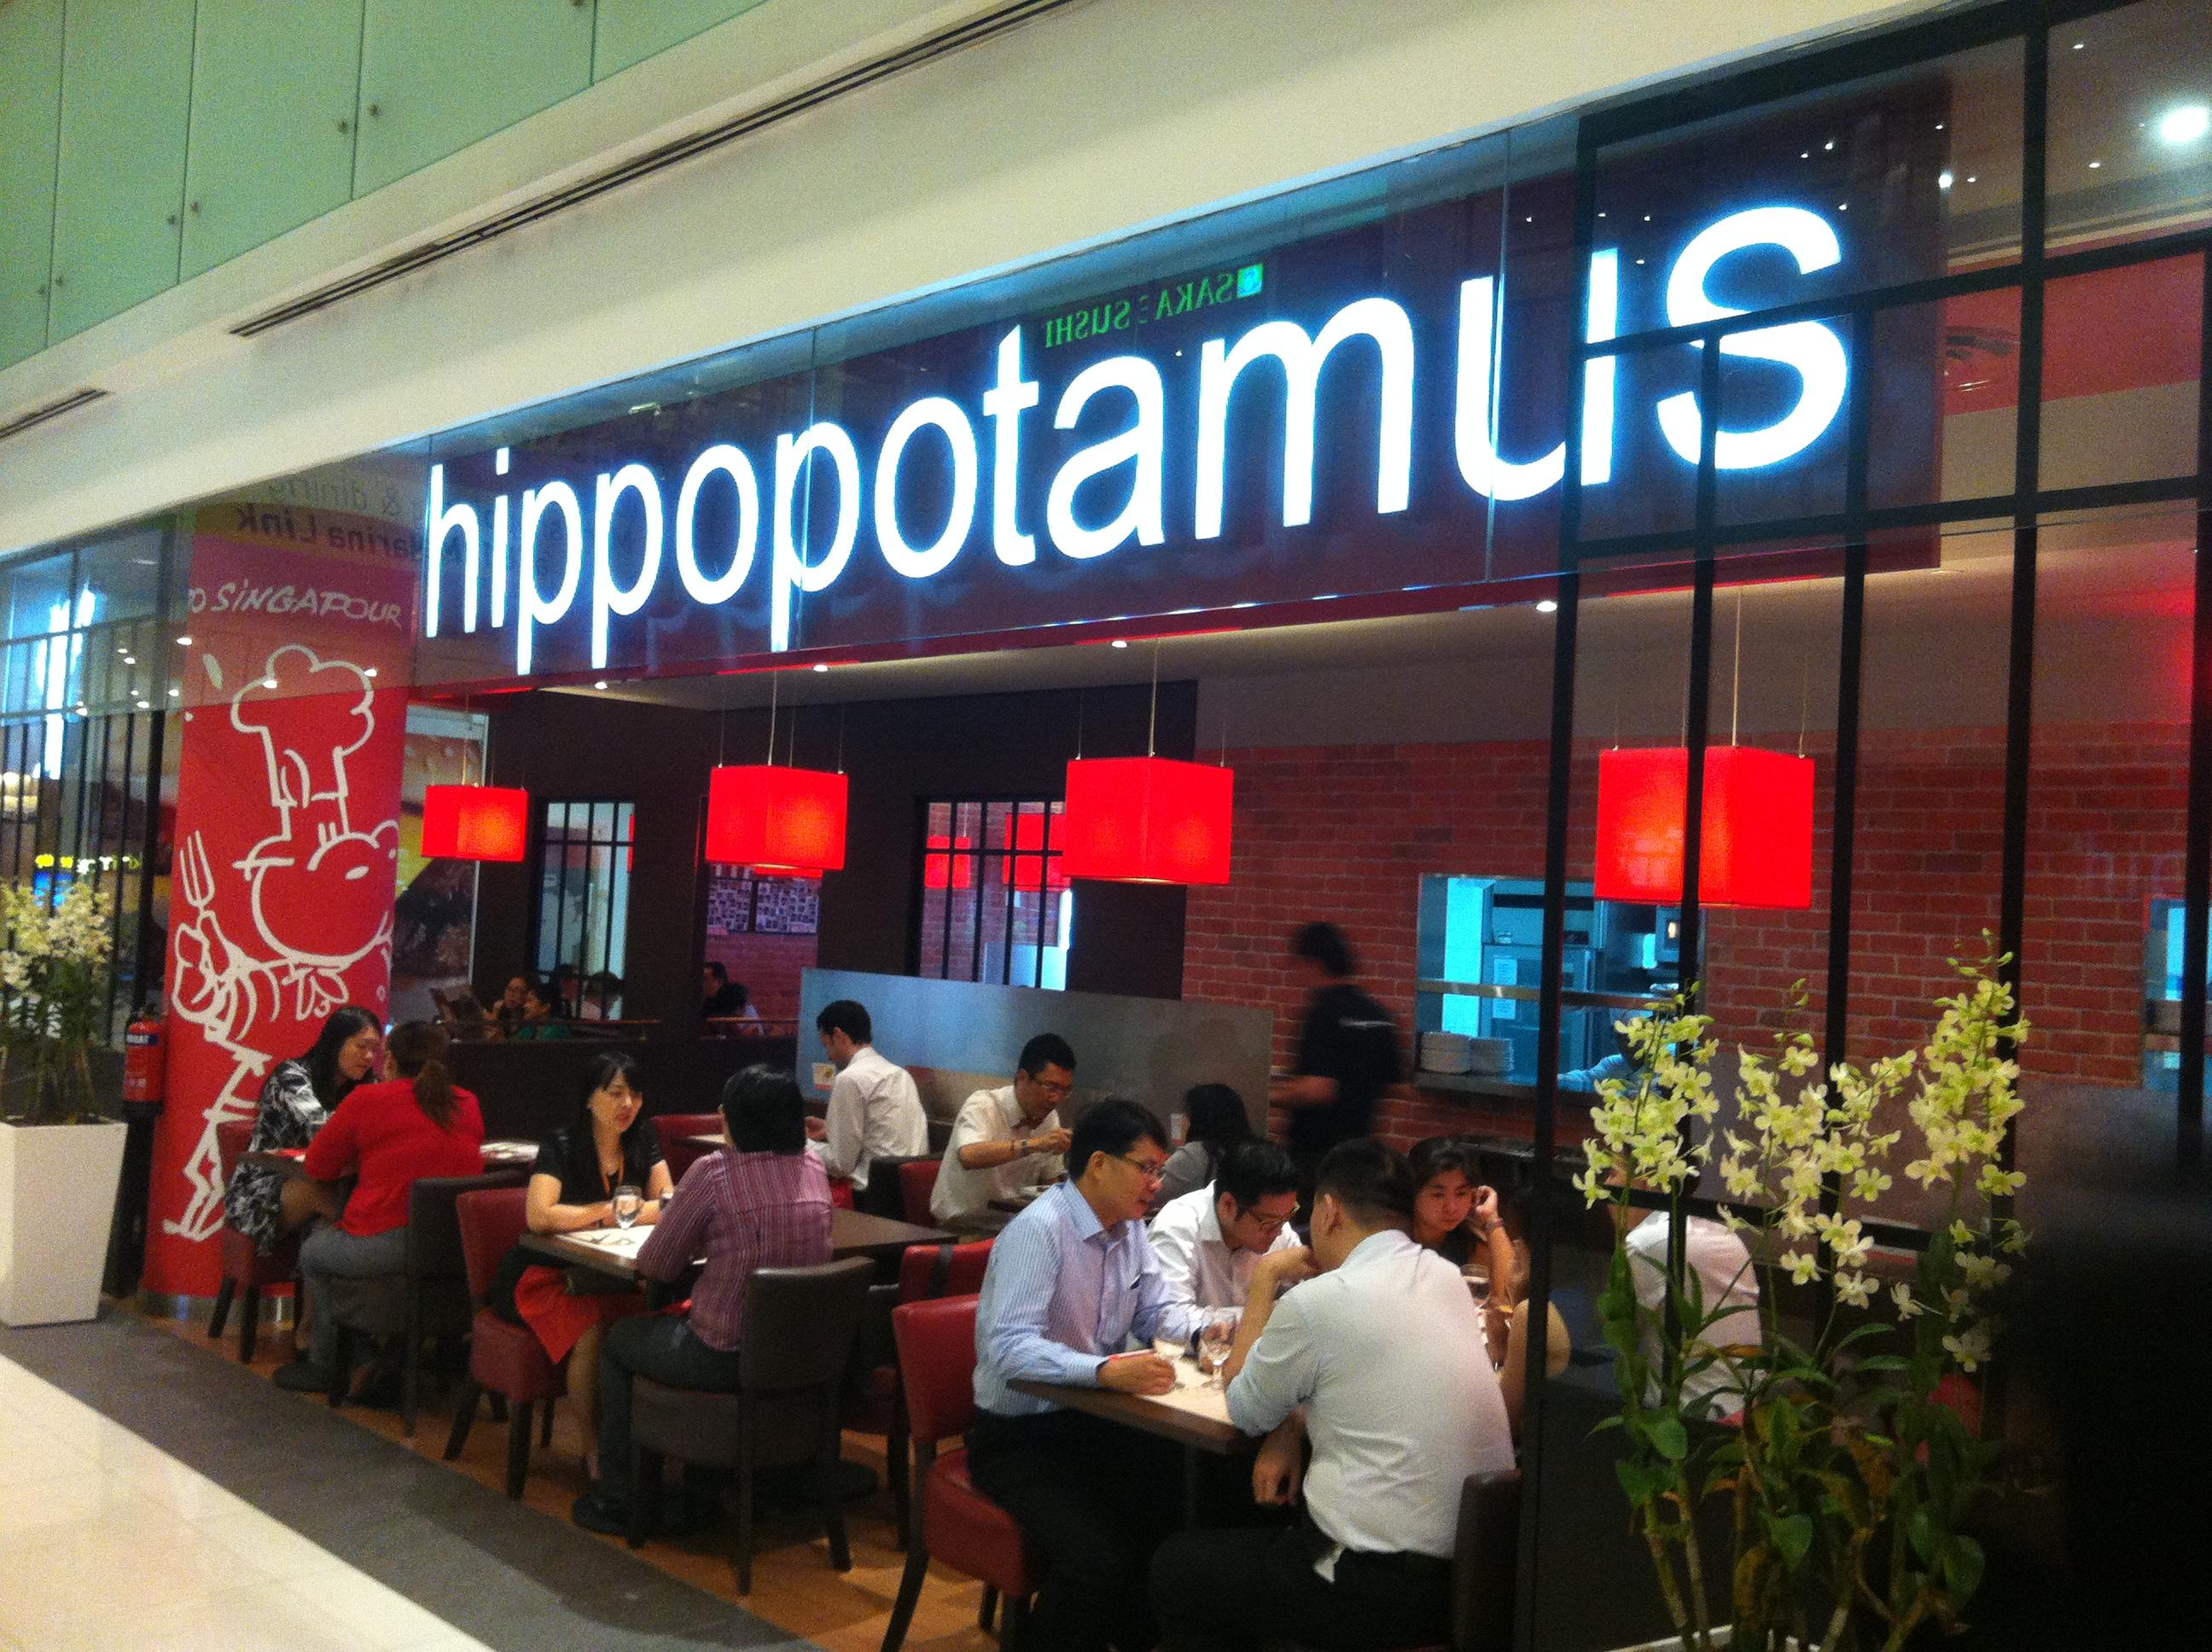 Bon appetit hippopotamus - Hippopotamus restaurant grill ...